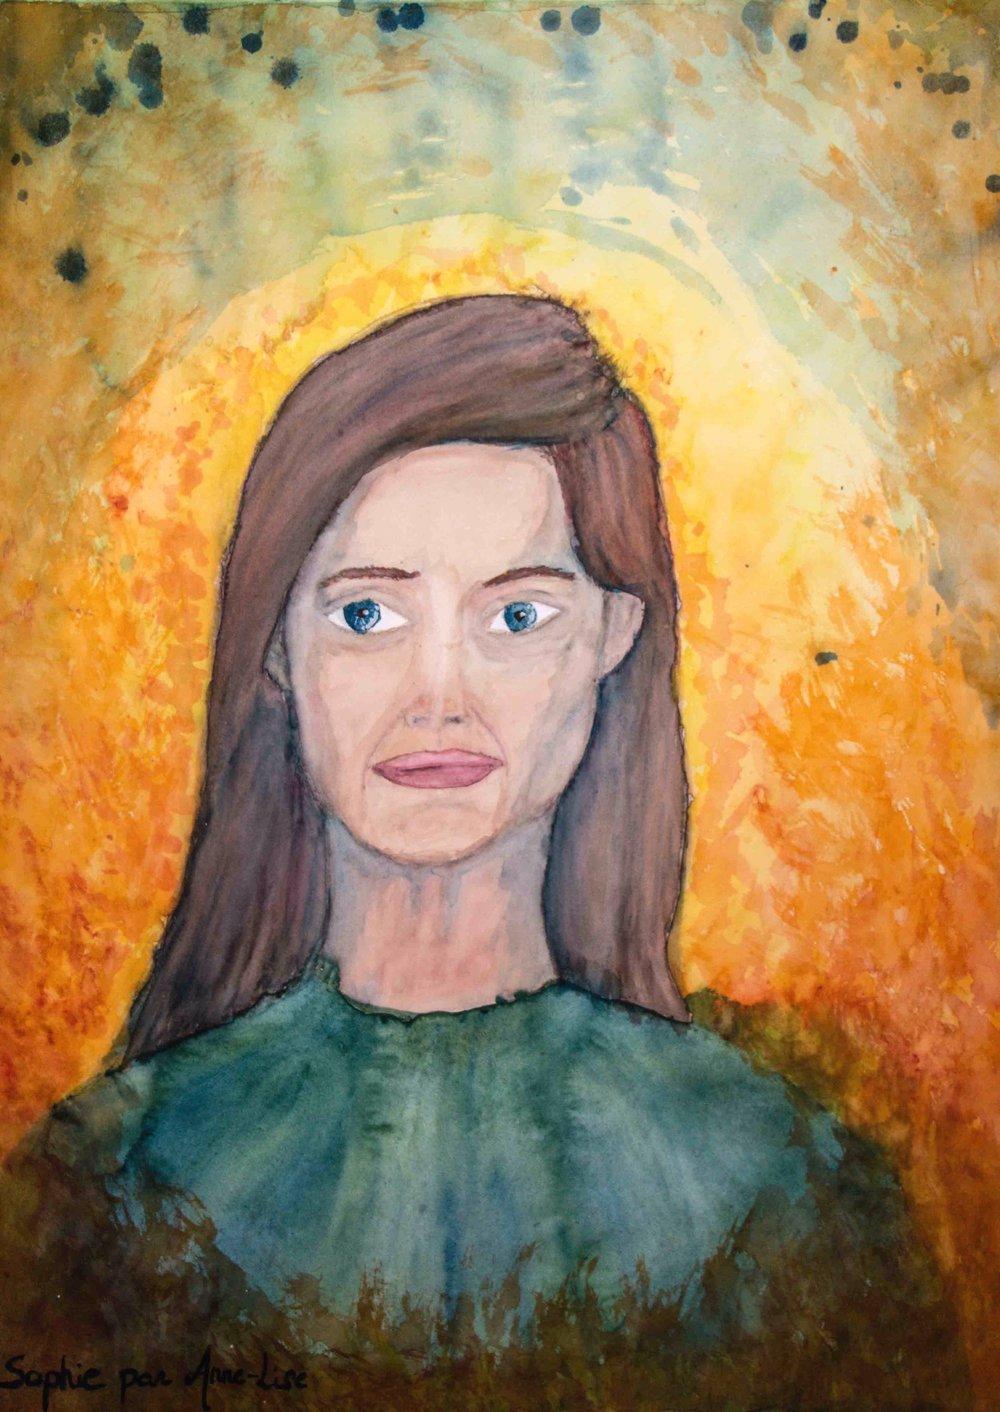 Sophie par Anne-lise